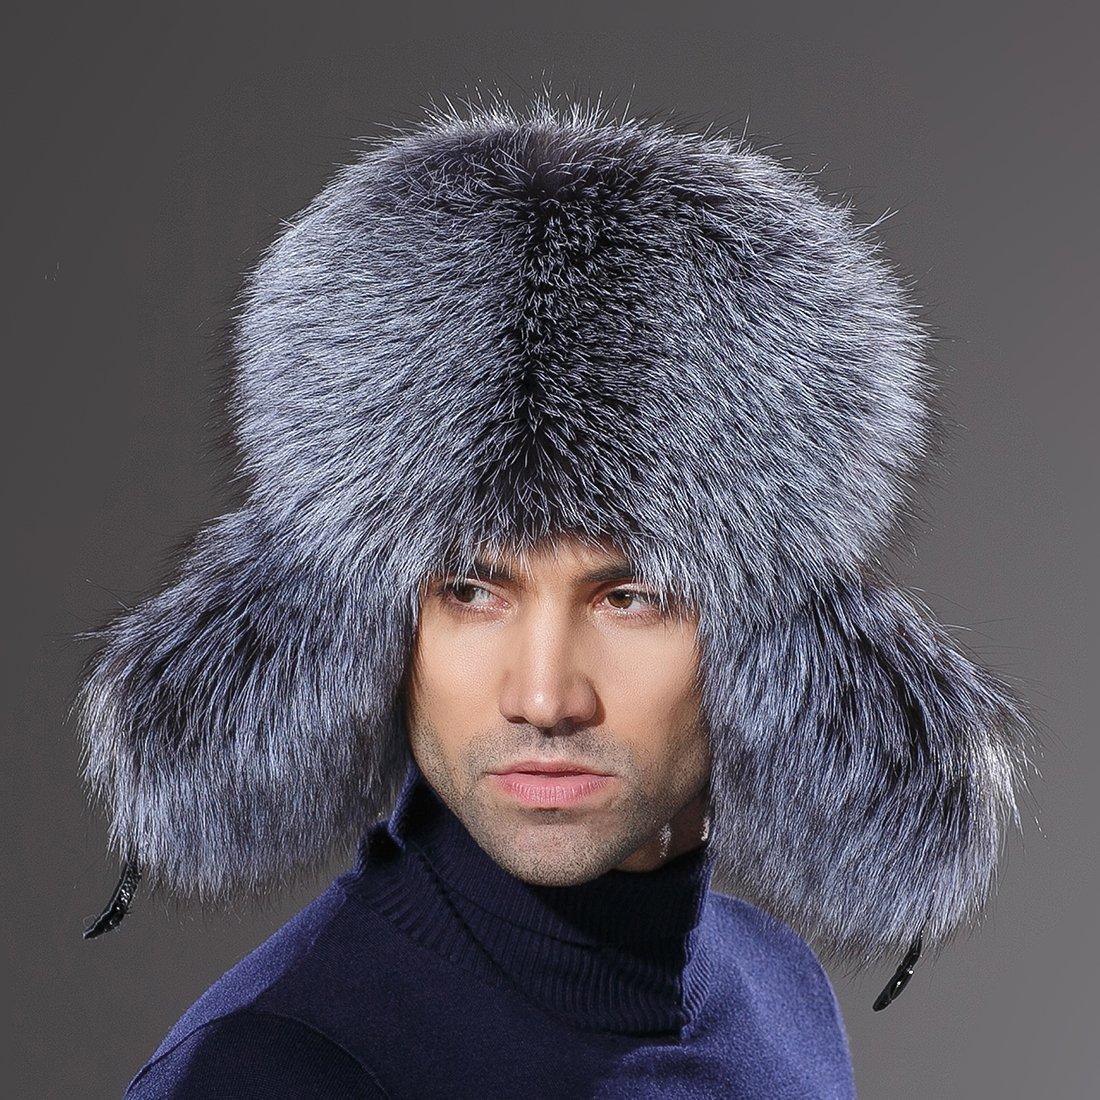 URSFUR Winter Mens Trapper Hat Real Leather Silver Fox Fur Russian Ushanka Cap by URSFUR (Image #6)